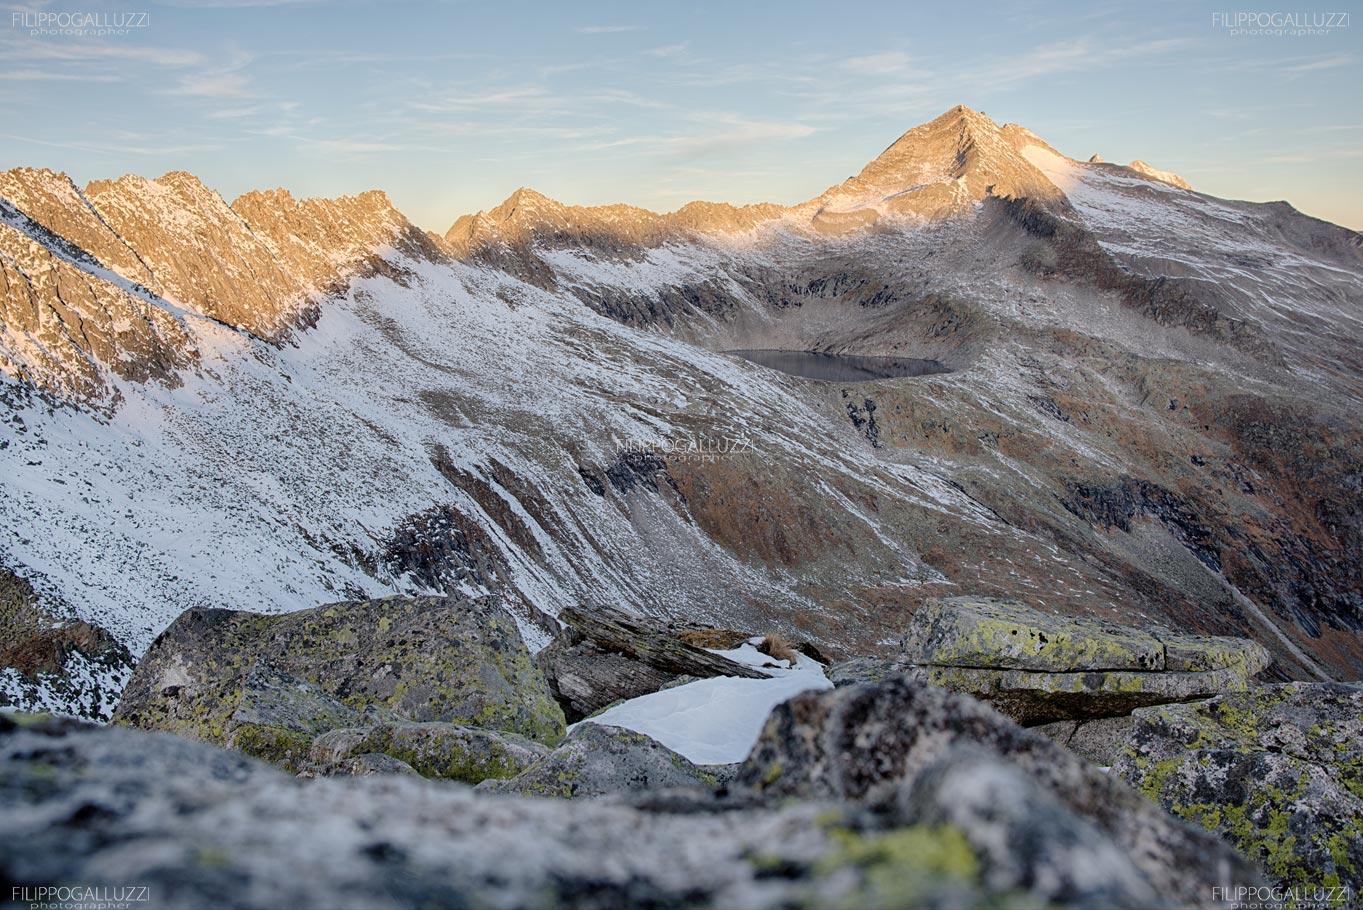 Le Alpi Austriache , Passo tei Tauri, Valle Aurina